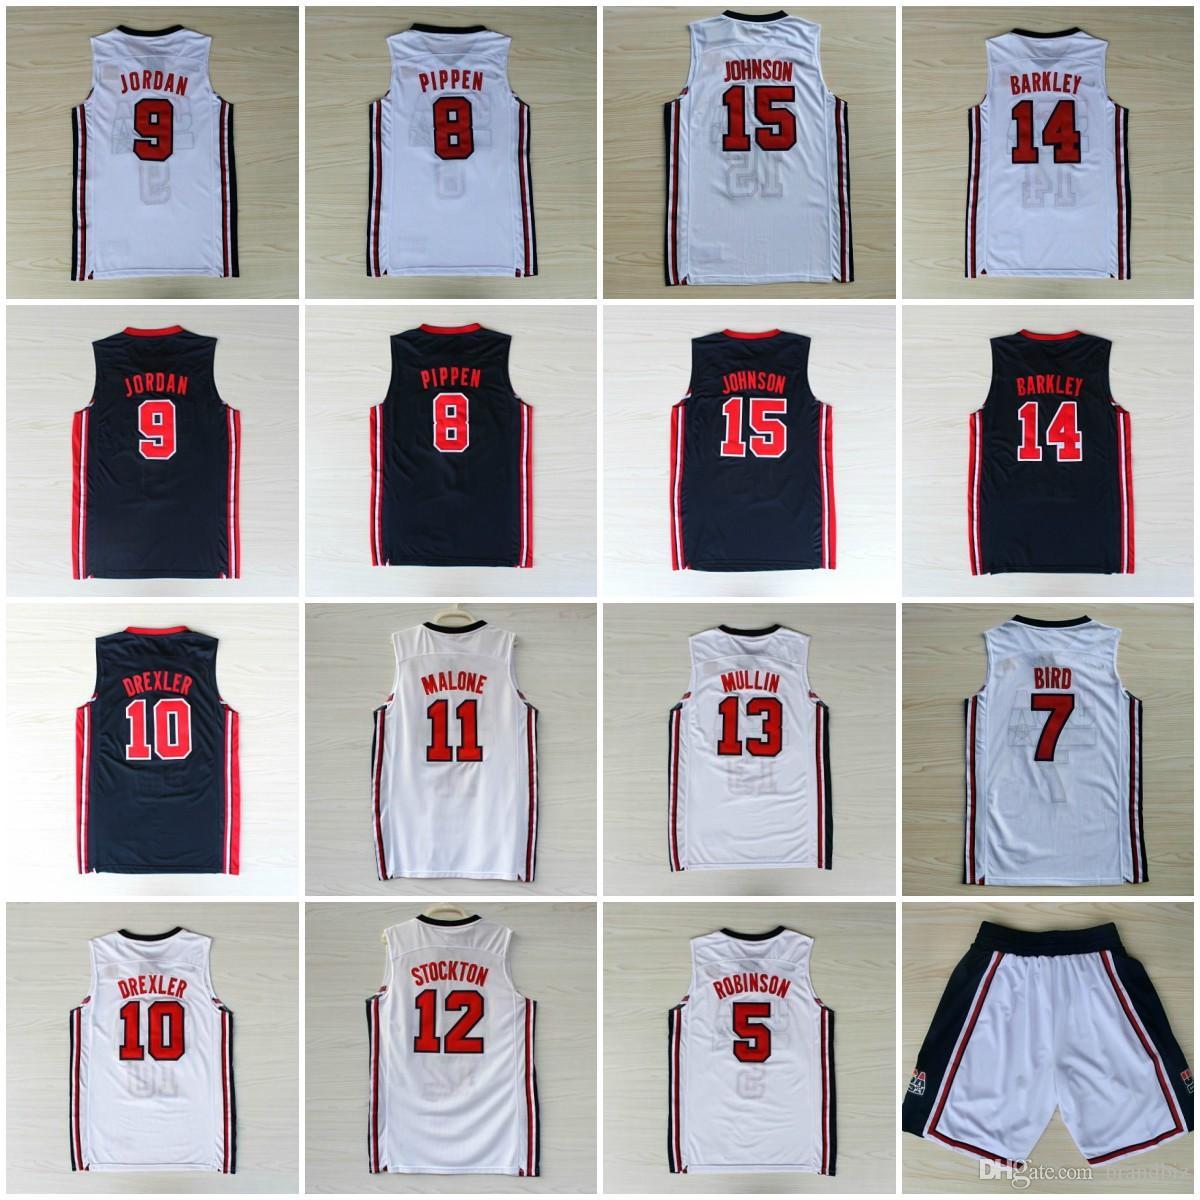 be78d294a044 2019 1992 USA Dream Team Robinson Jersey Ewing Bird Pippen MJ Clyde Drexler  Malone Stockton Mullin Barkley Johnson Mens Stitched Shorts College From ...